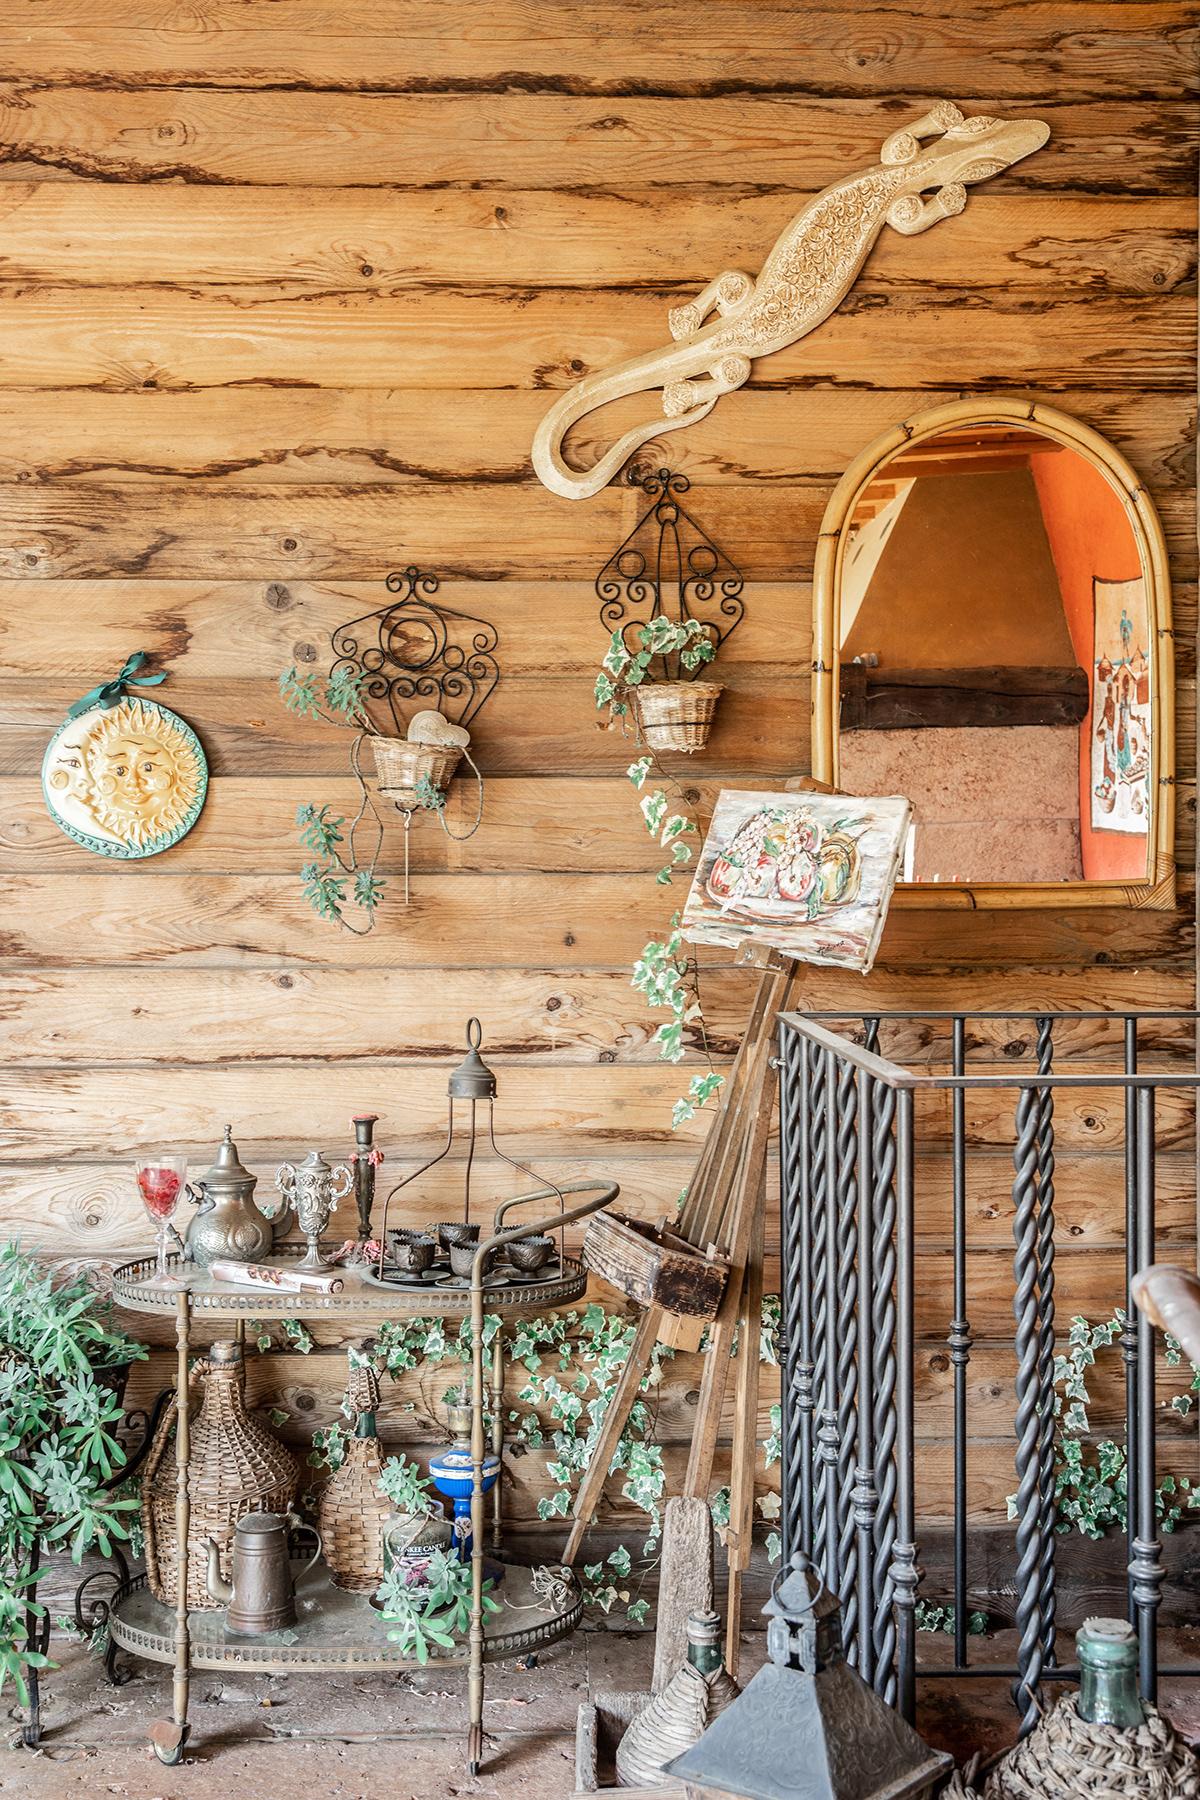 architecture country design farm garden green house Interior vintage wood